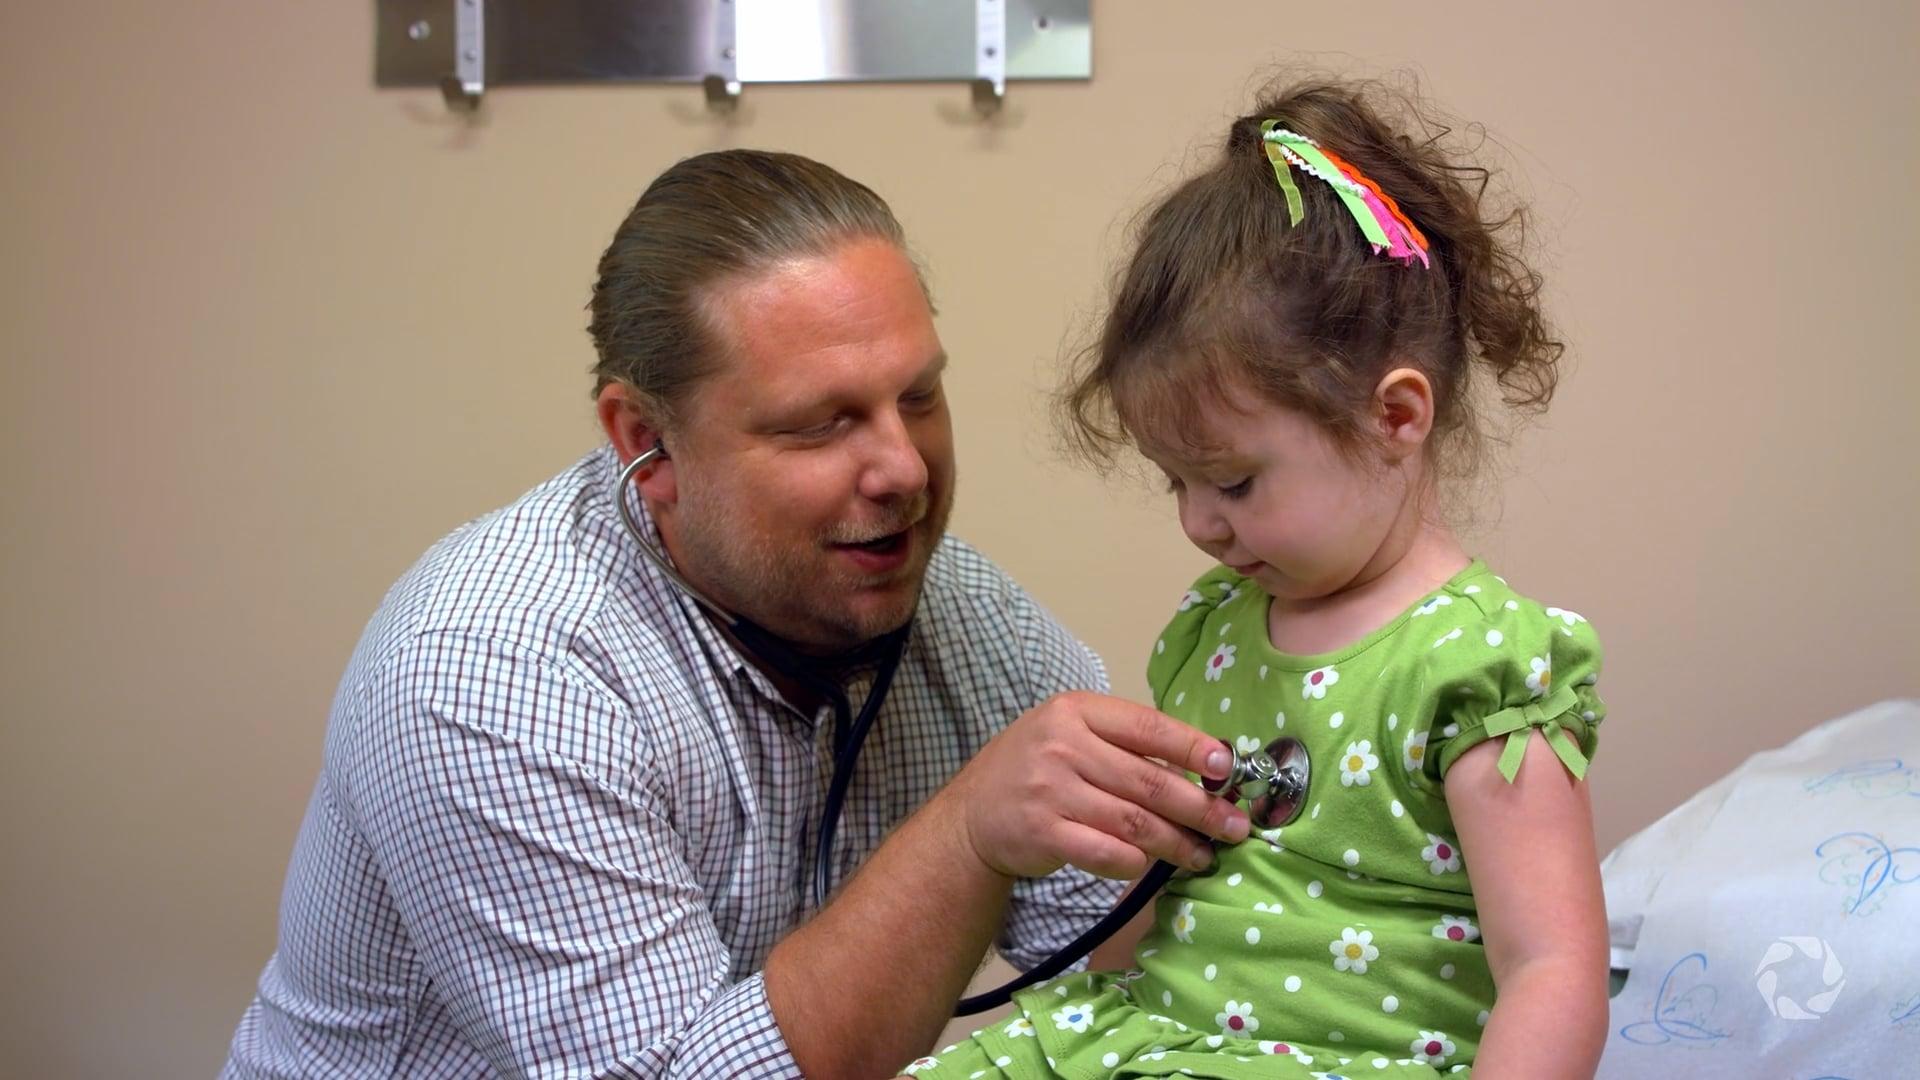 Meet Pediatrician Dr. Brian Proctor